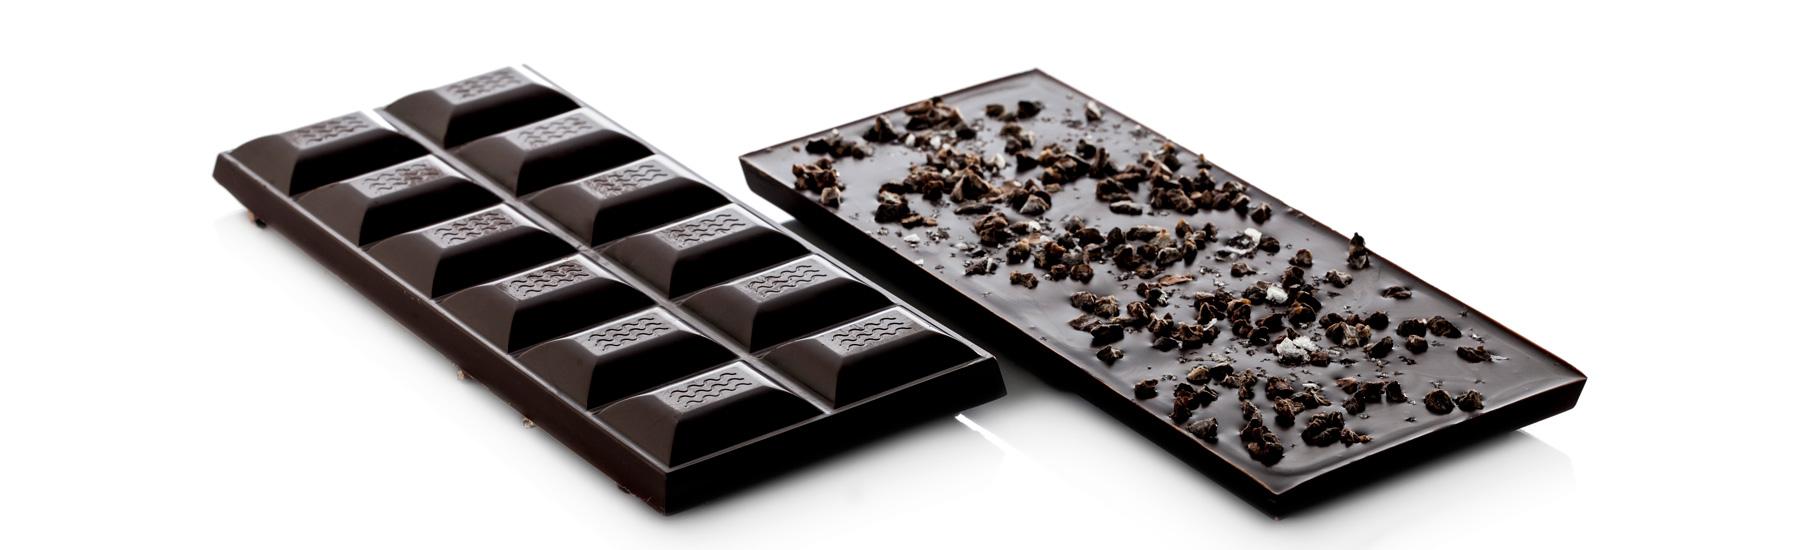 dark-couverture-chocolates-slider_eses.jpg